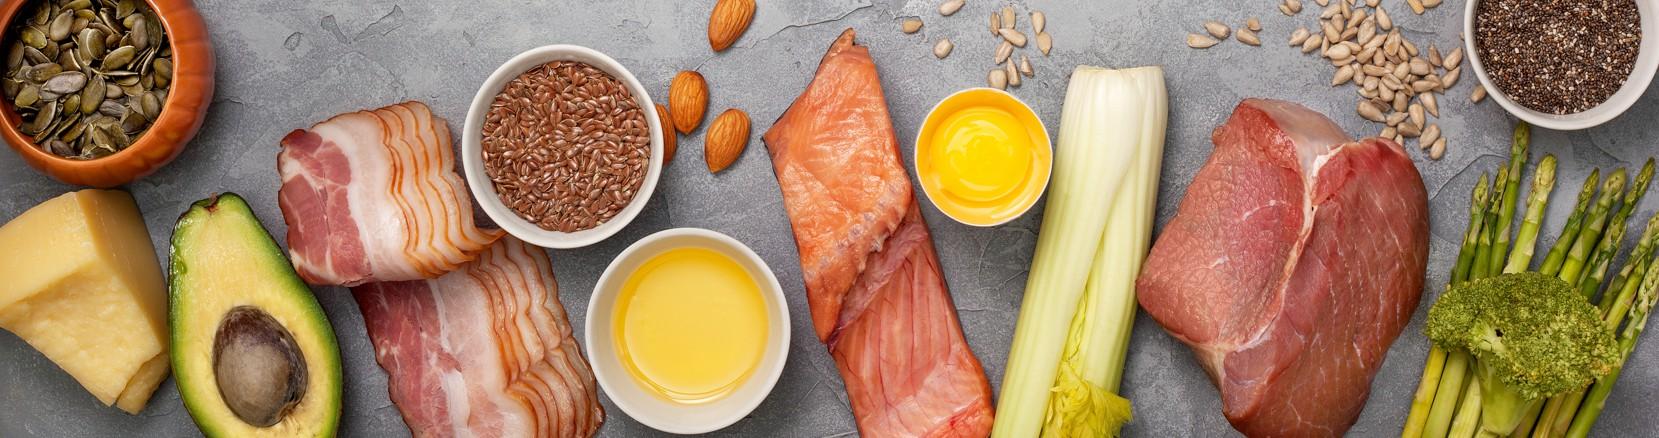 Dieta cetogénica aplicada a terapia